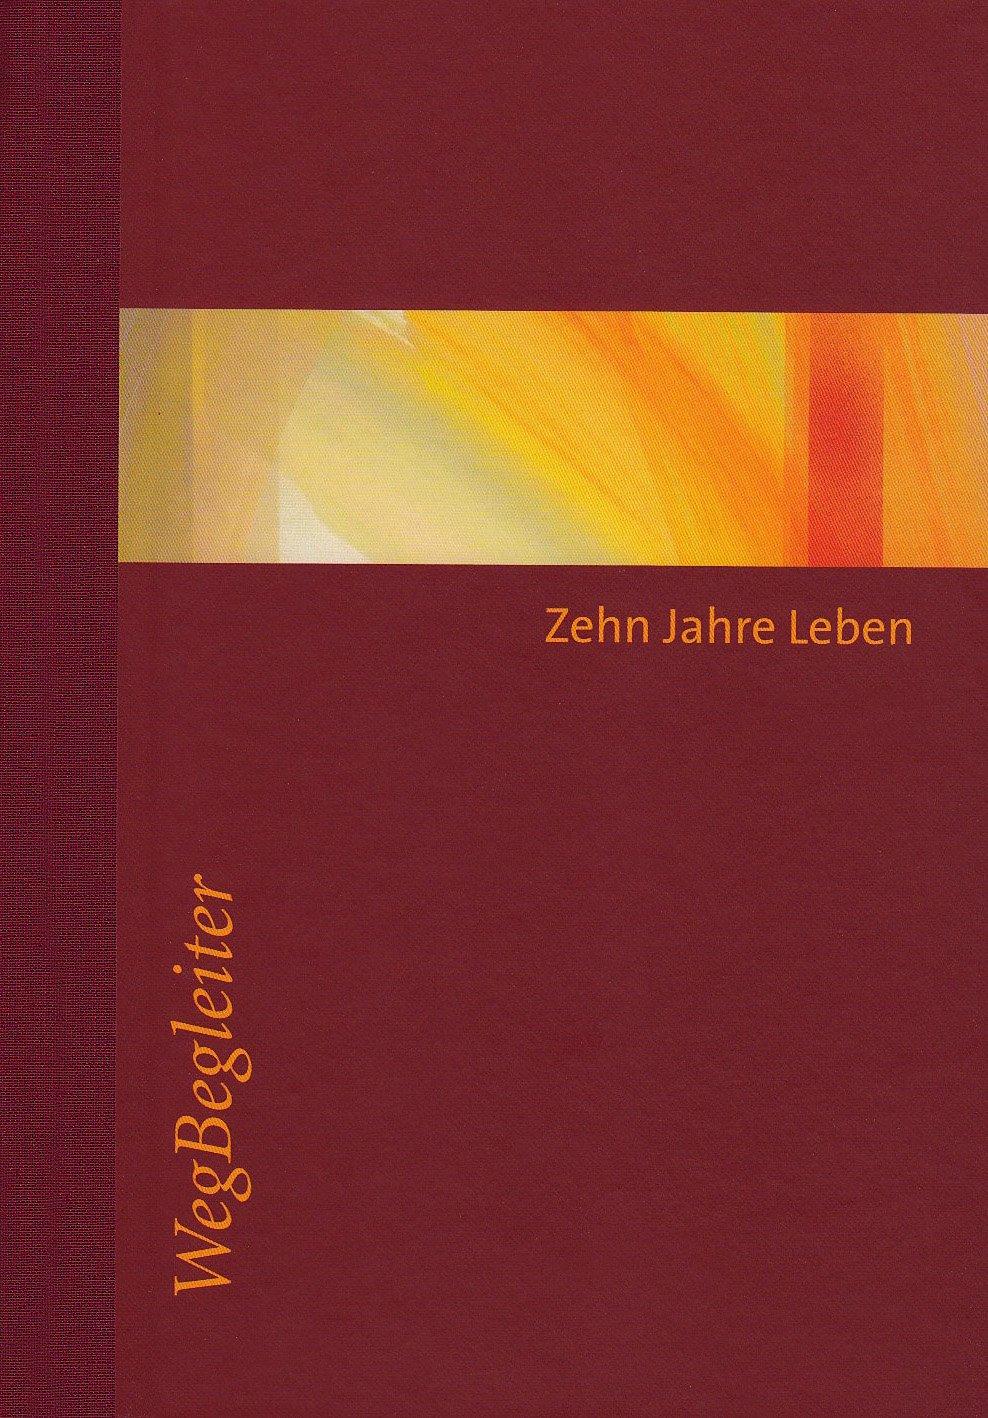 Zehn Jahre Leben - Eberhard Münch